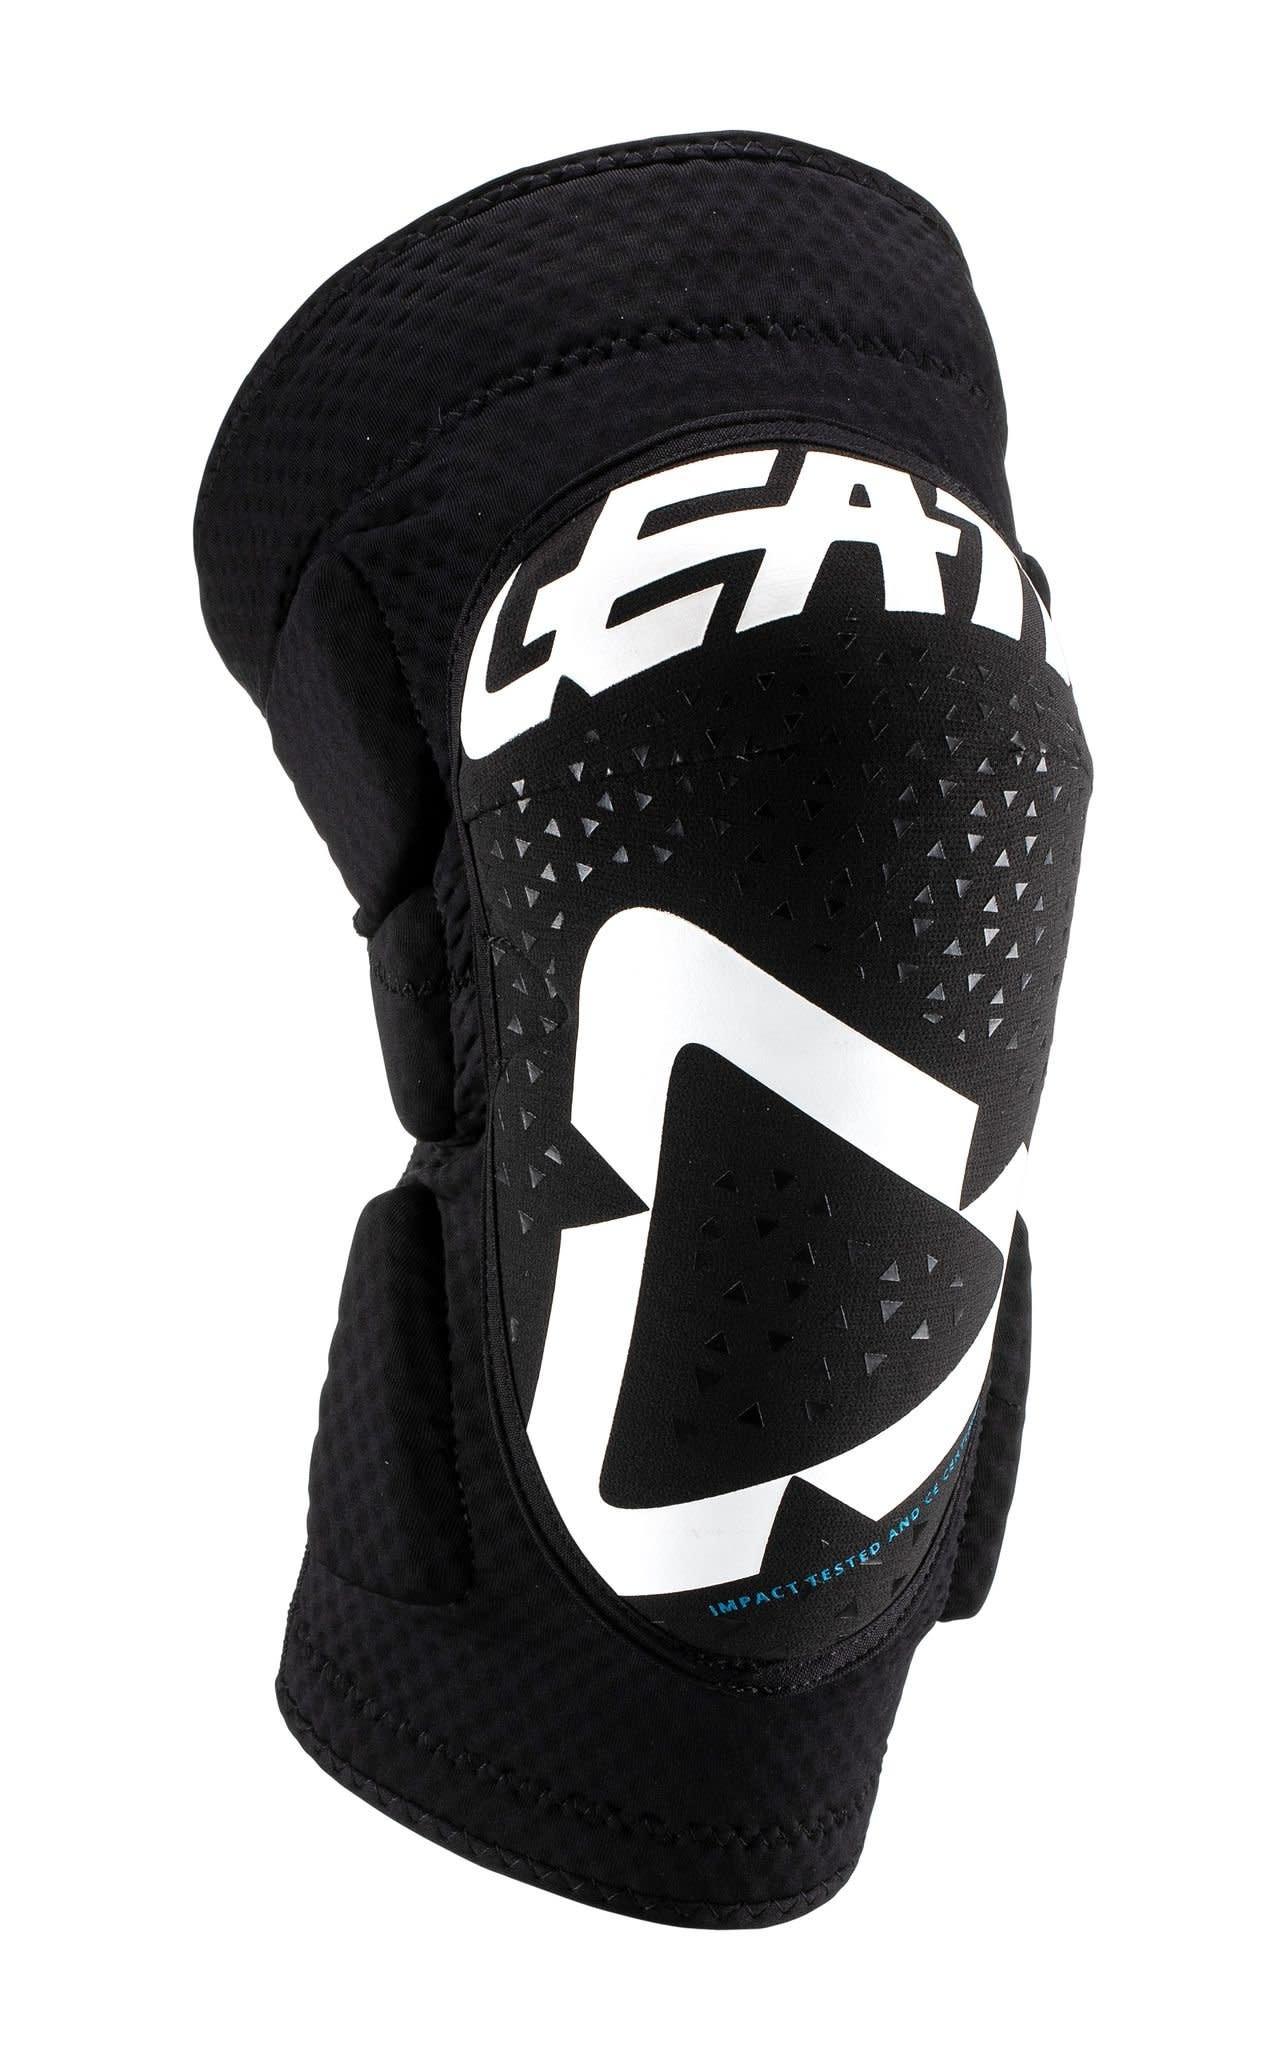 Leatt Leatt, 3DF 5.0 Mini, Knee/Shin Guard, Youth, White/Black, S, Pair